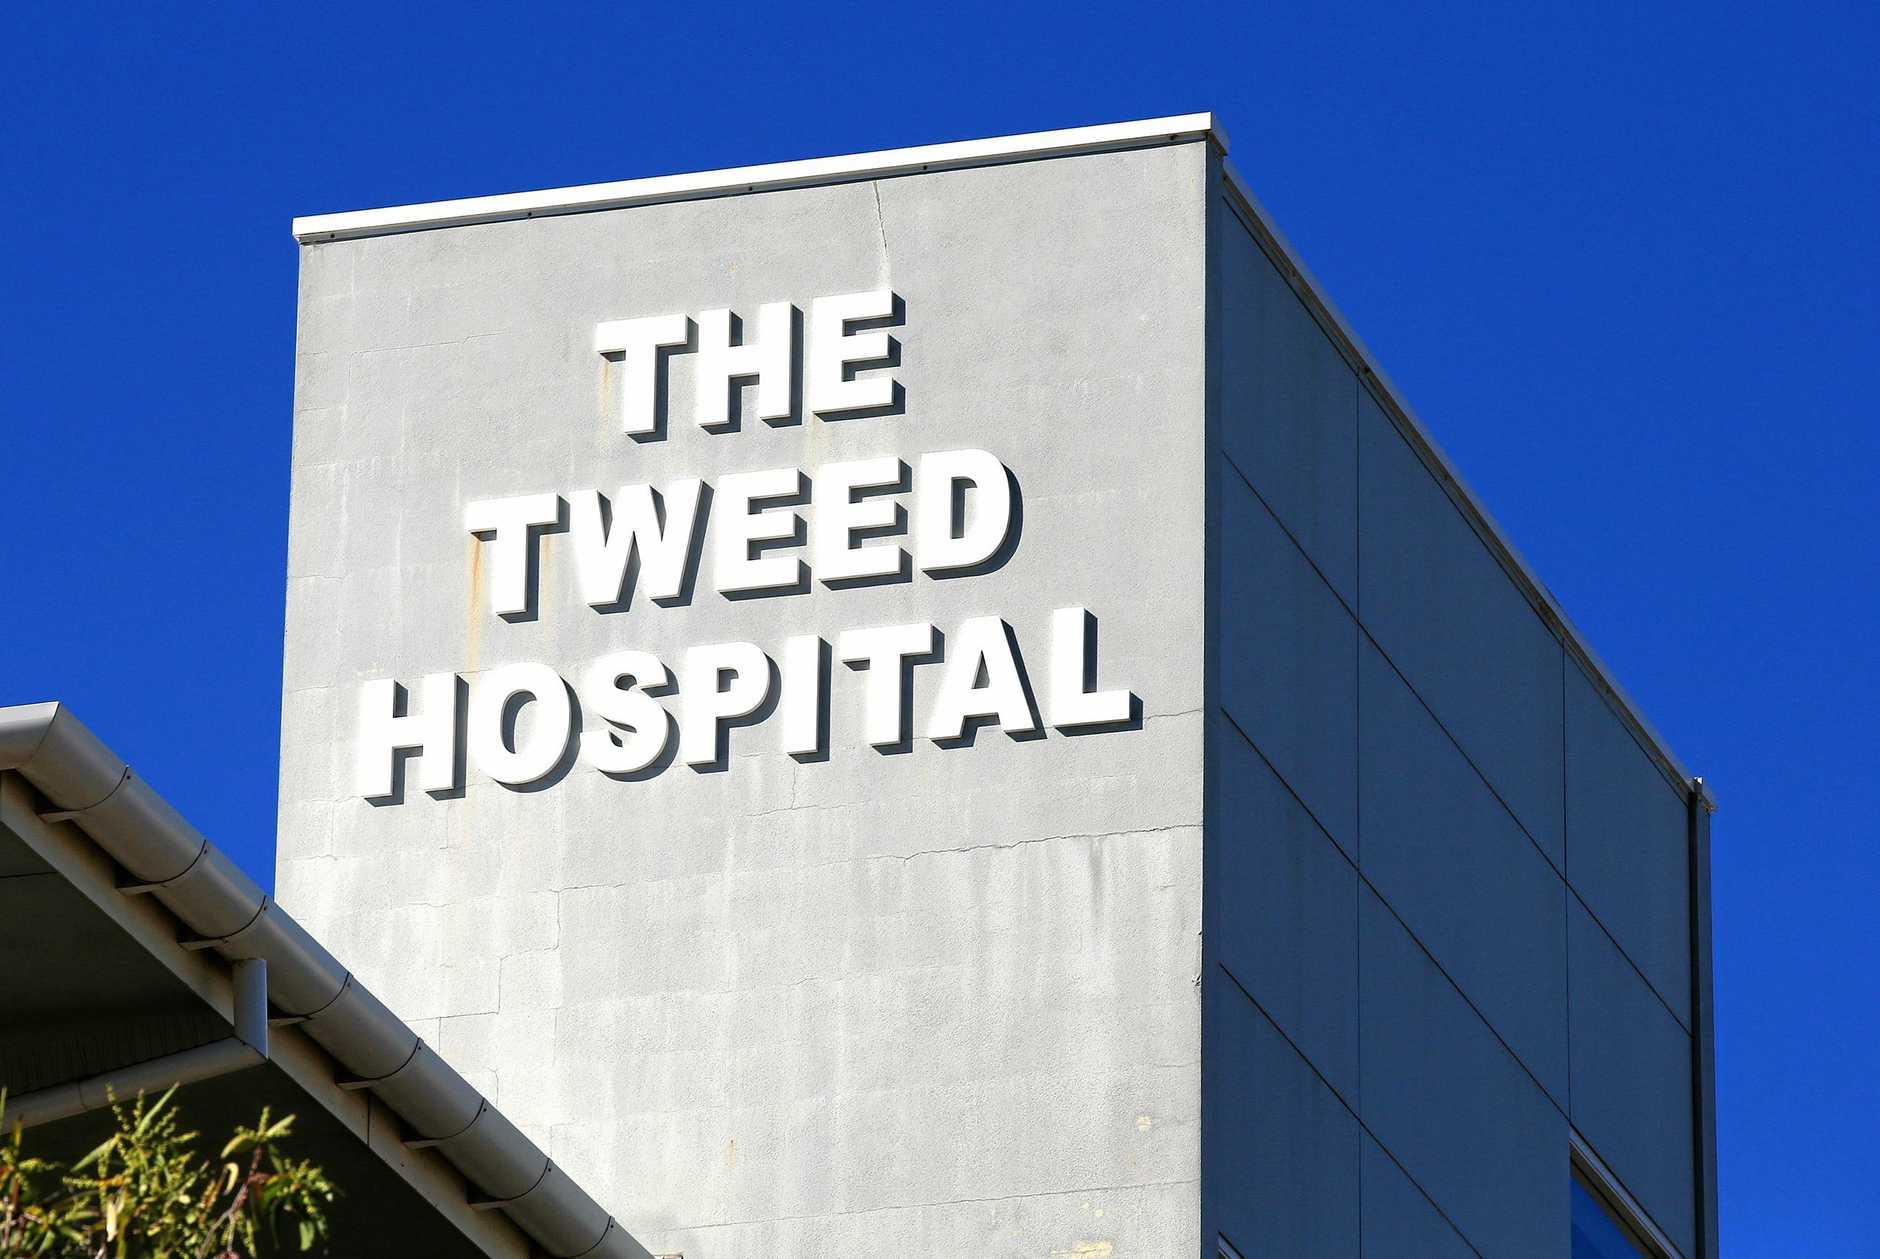 The Tweed Heads Hospital